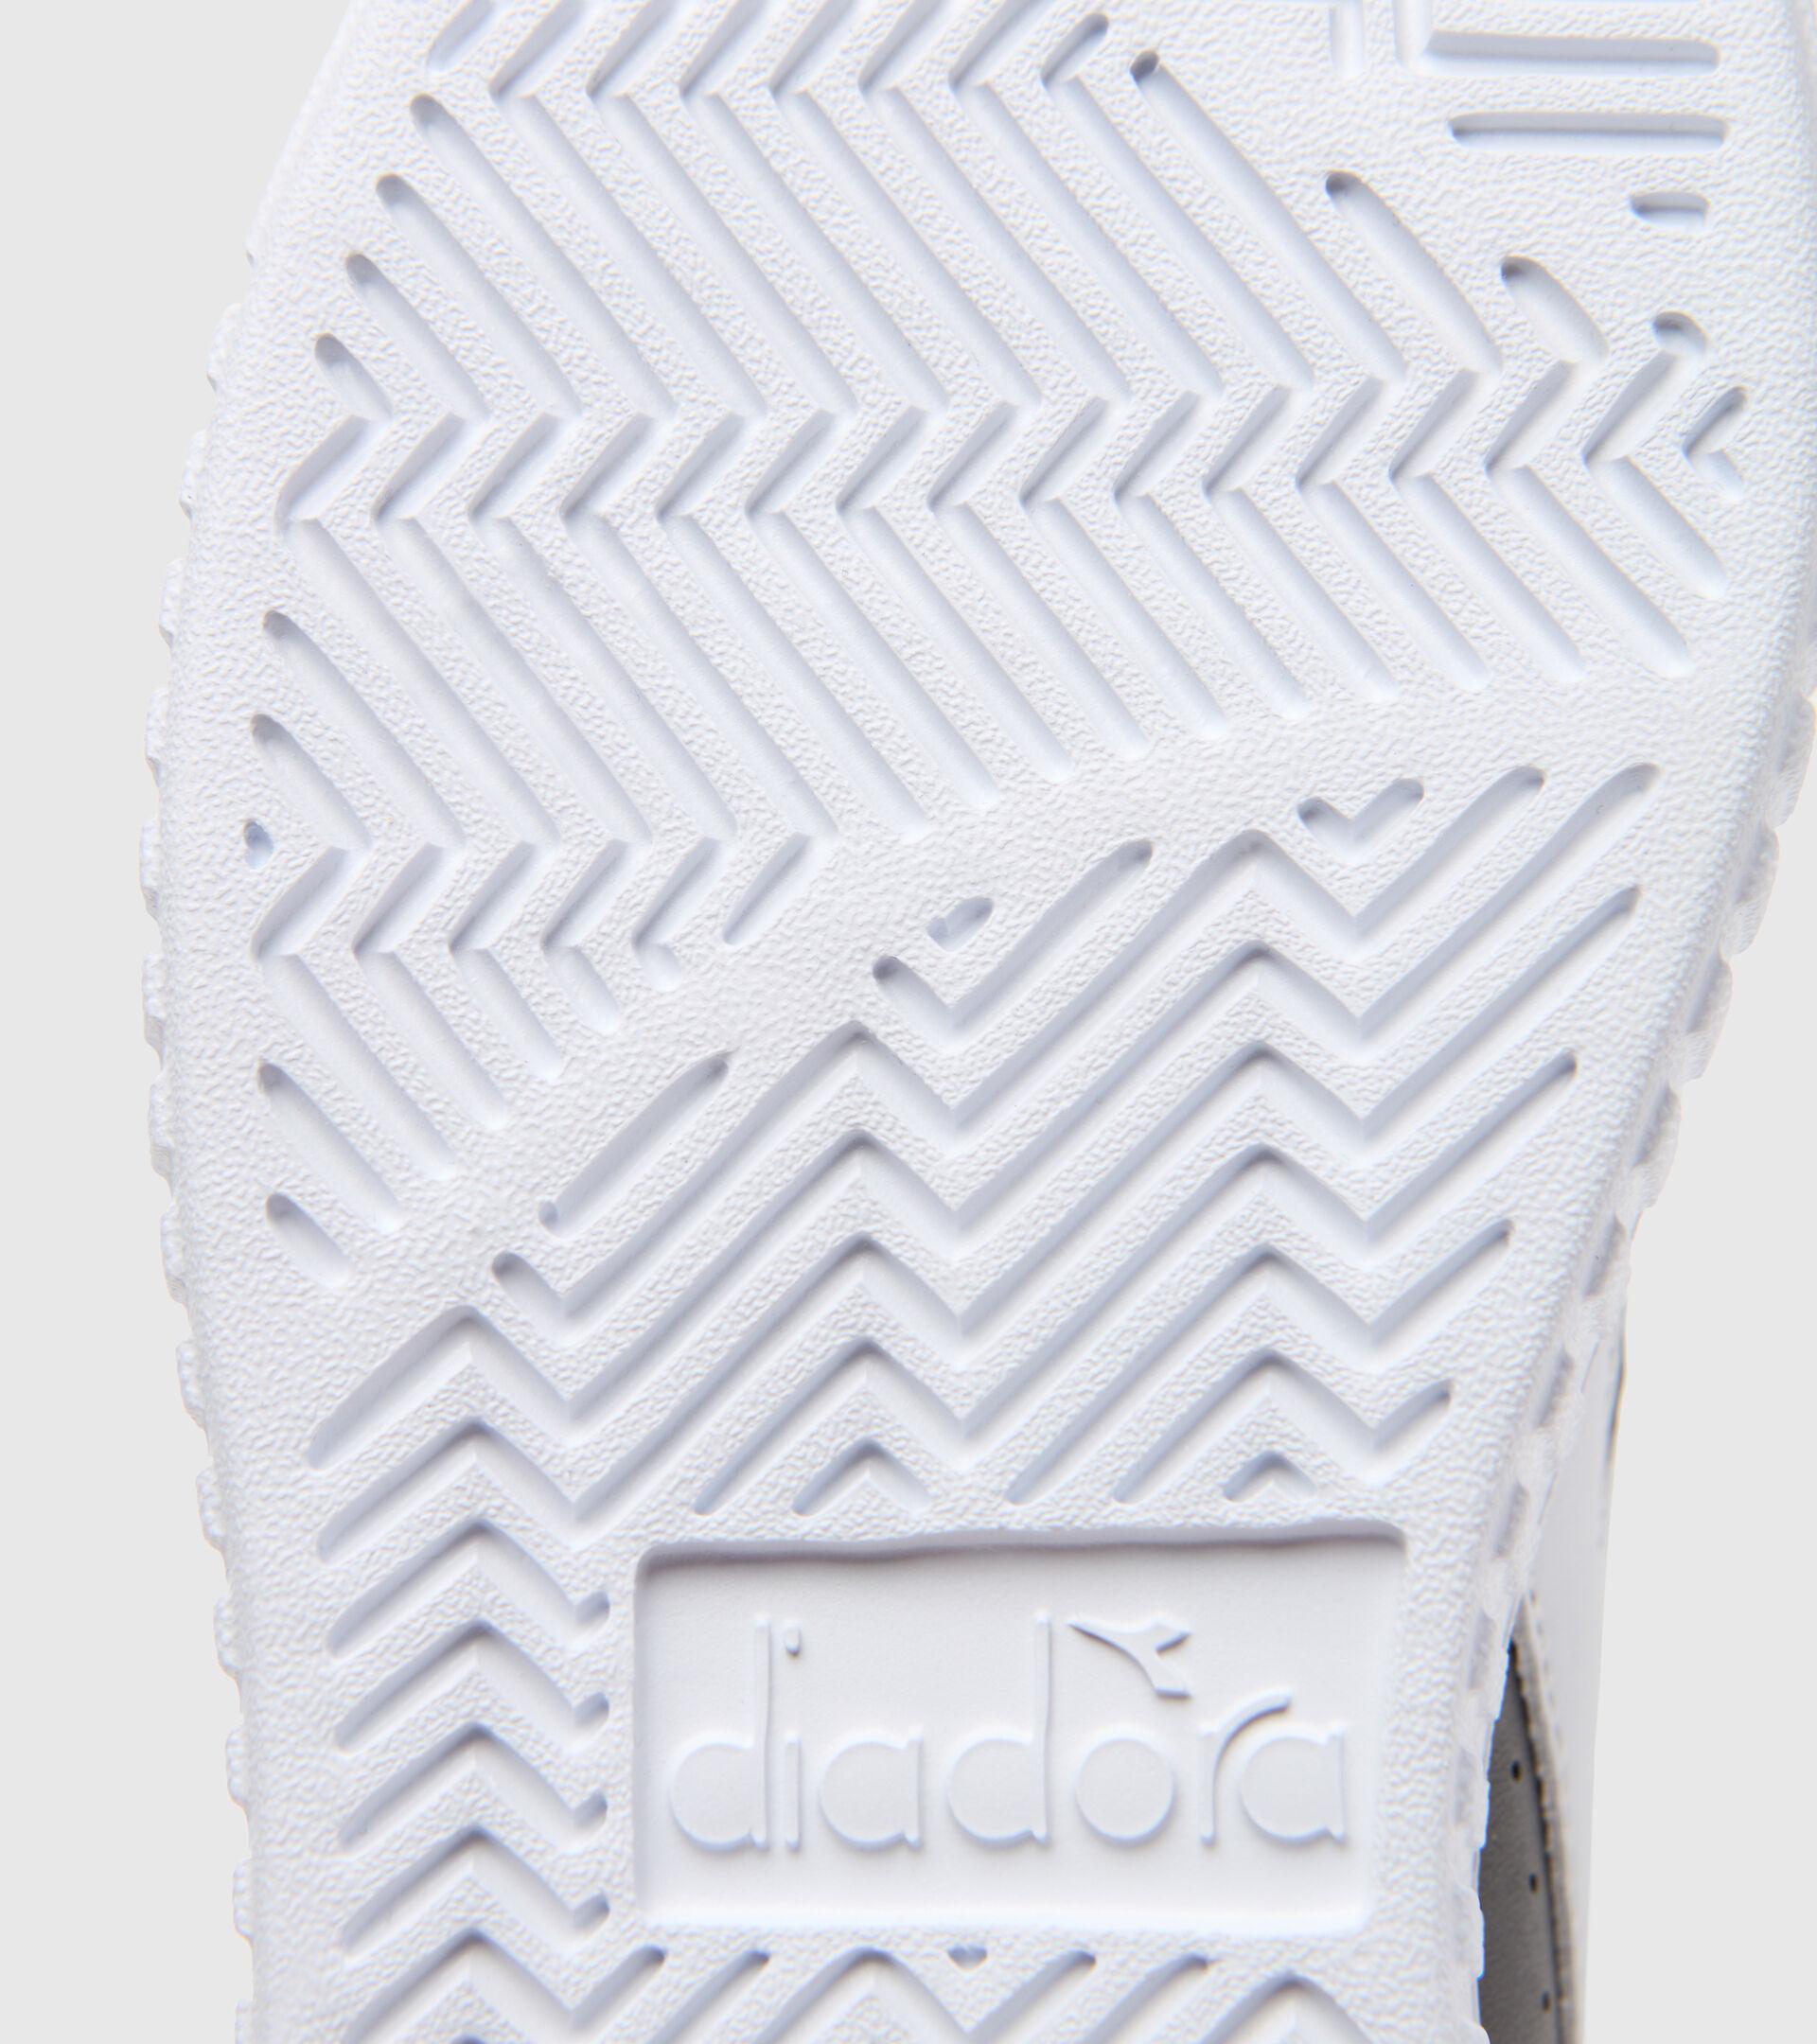 Footwear Sport BAMBINO GAME STEP GS NERO/BIANCO Diadora